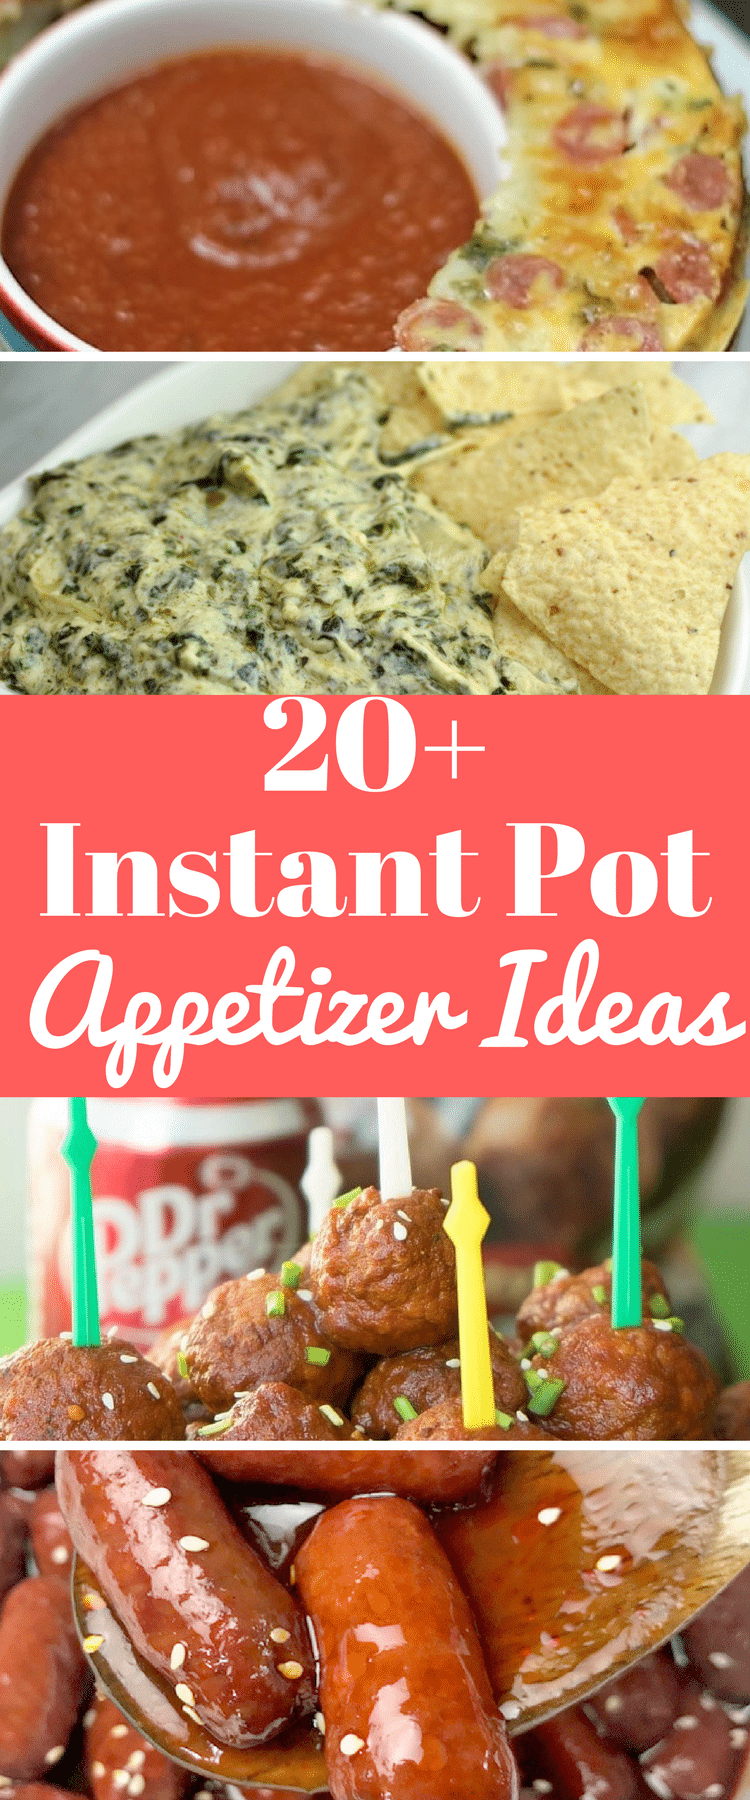 20 Crowd Pleasing Instant Pot Appetizer Recipes